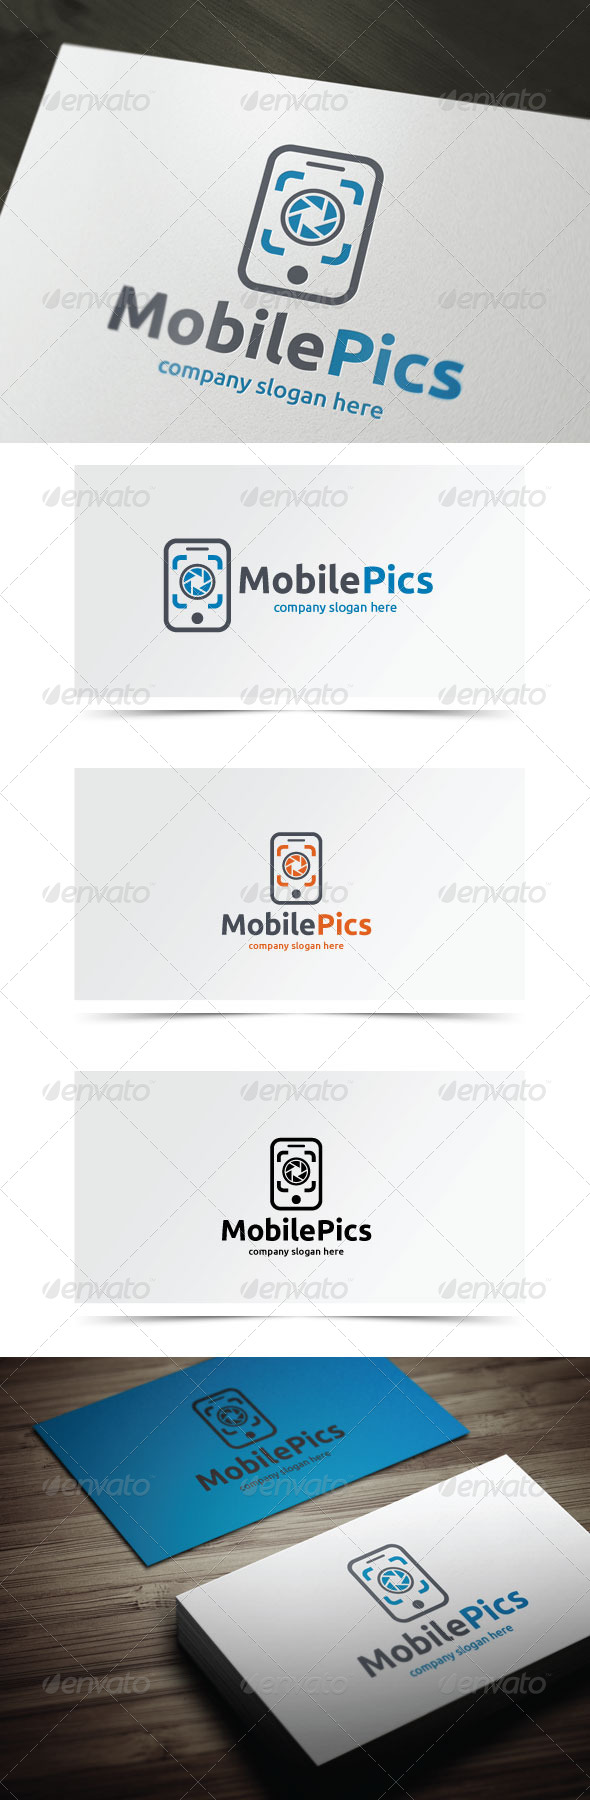 Mobile Pics - Symbols Logo Templates